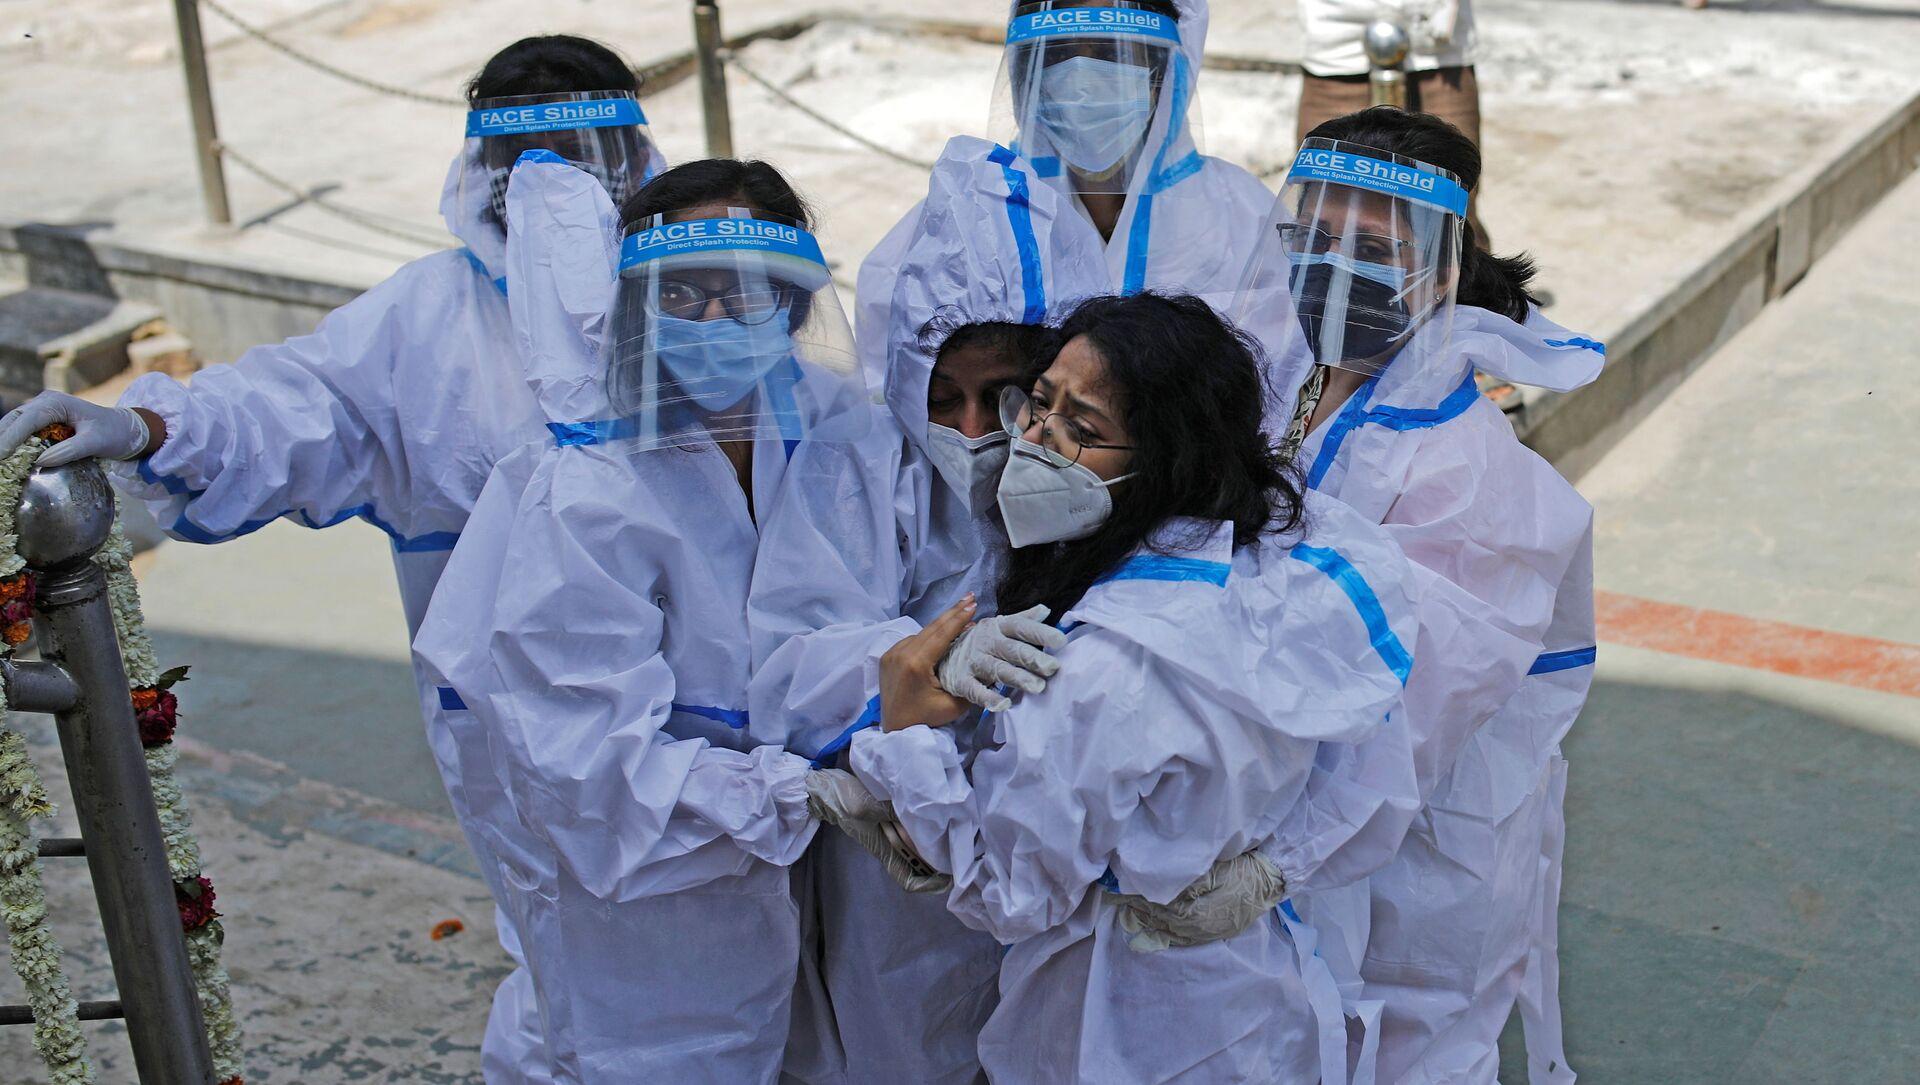 Pandemia koronawirusa SARS-CoV-2. New Delhi, Indie. - Sputnik Polska, 1920, 29.04.2021